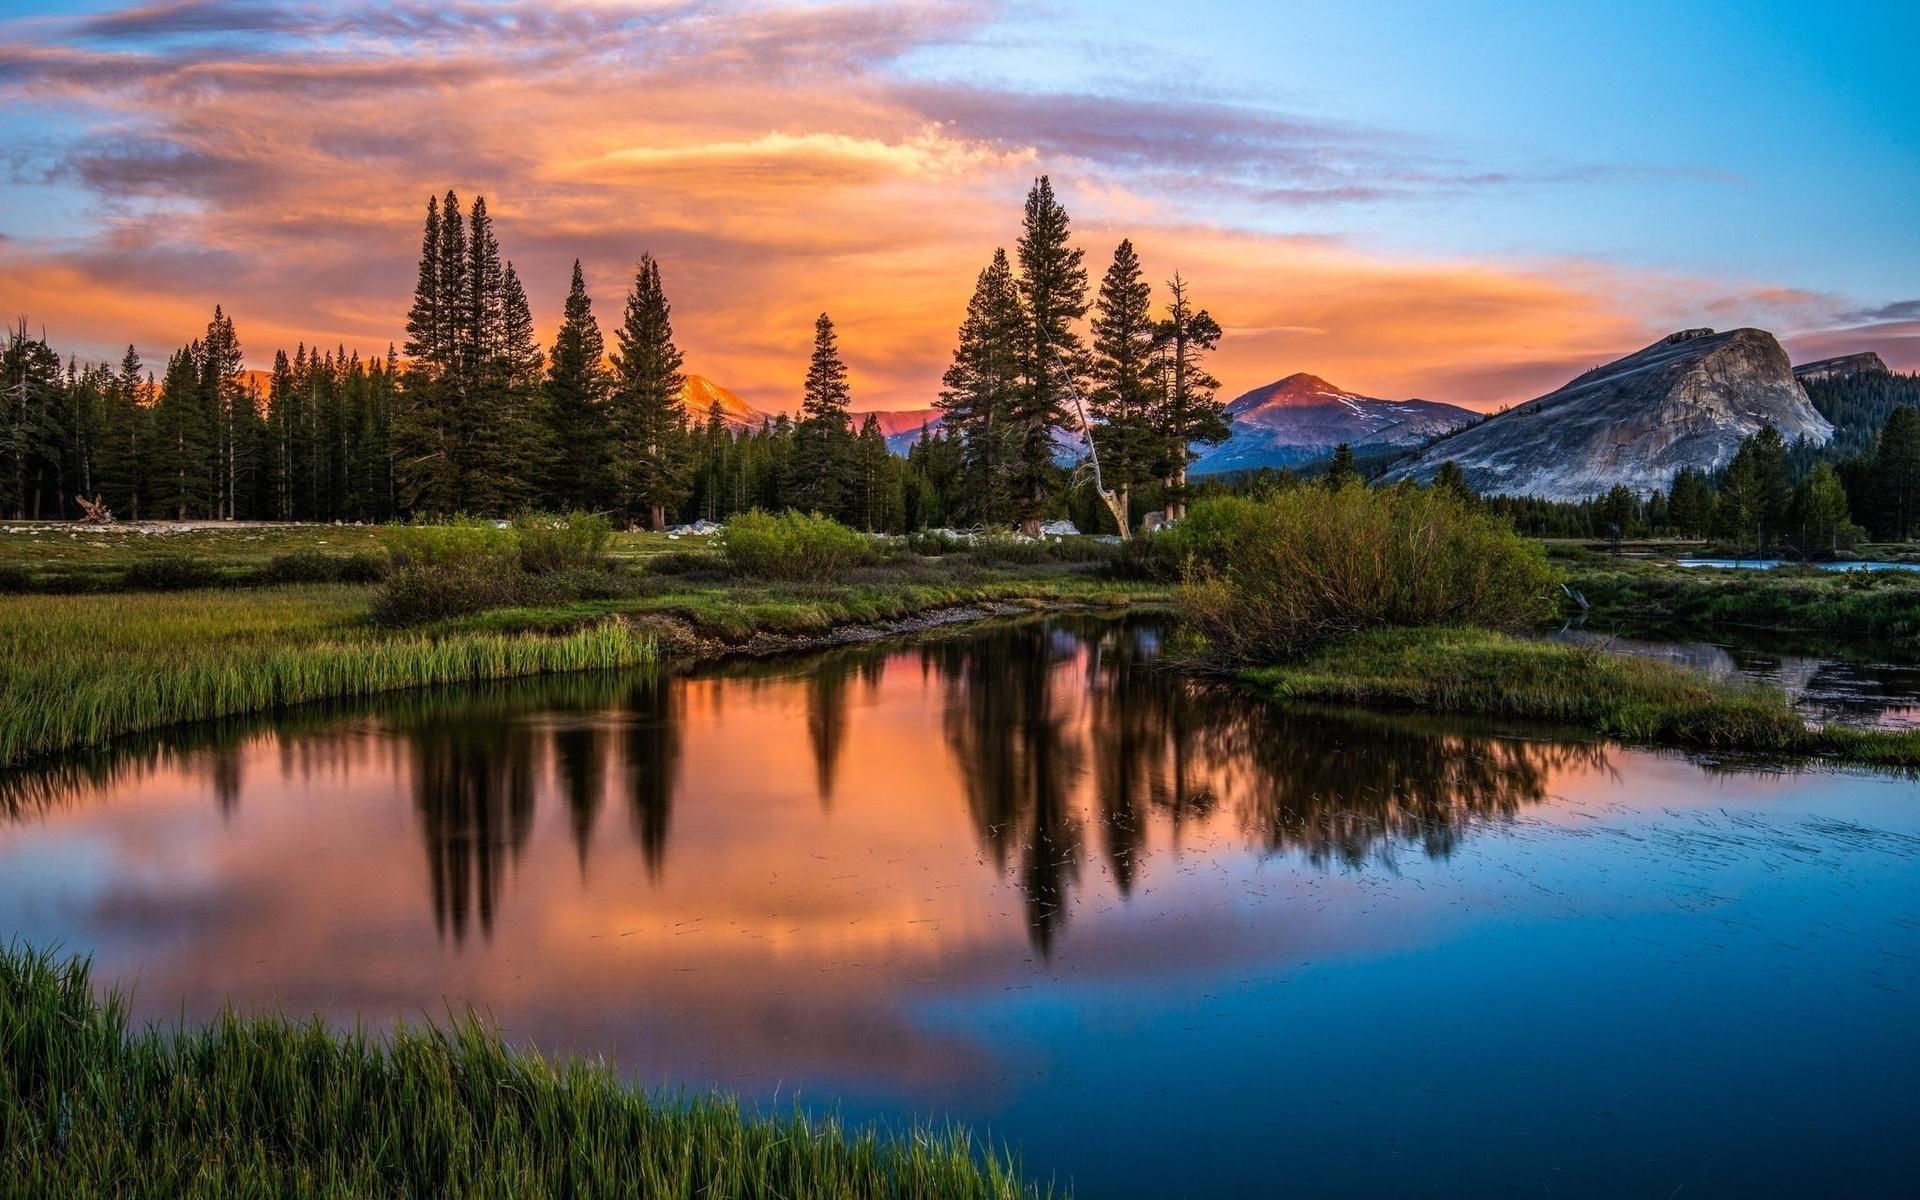 Homtom Mobile Full Hd Potos: Nature Sky Mountain Lake Sunset Orange Sunset Cloud Tree